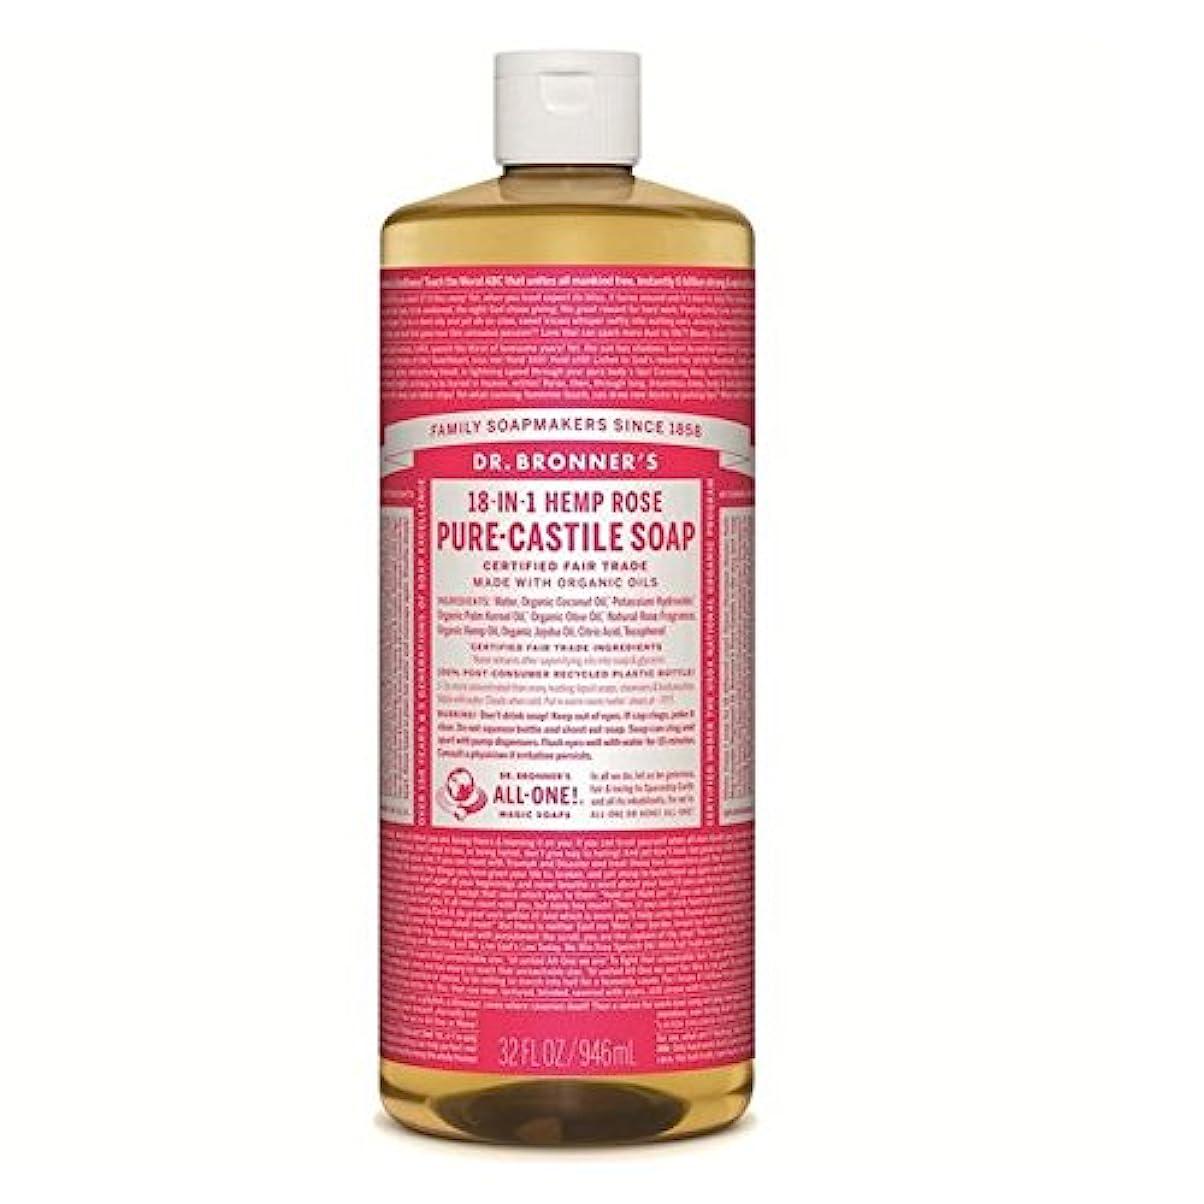 Dr Bronner Organic Rose Castile Liquid Soap 946ml (Pack of 6) - ブロナー有機カスティーリャ液体石鹸946ミリリットルローズ x6 [並行輸入品]